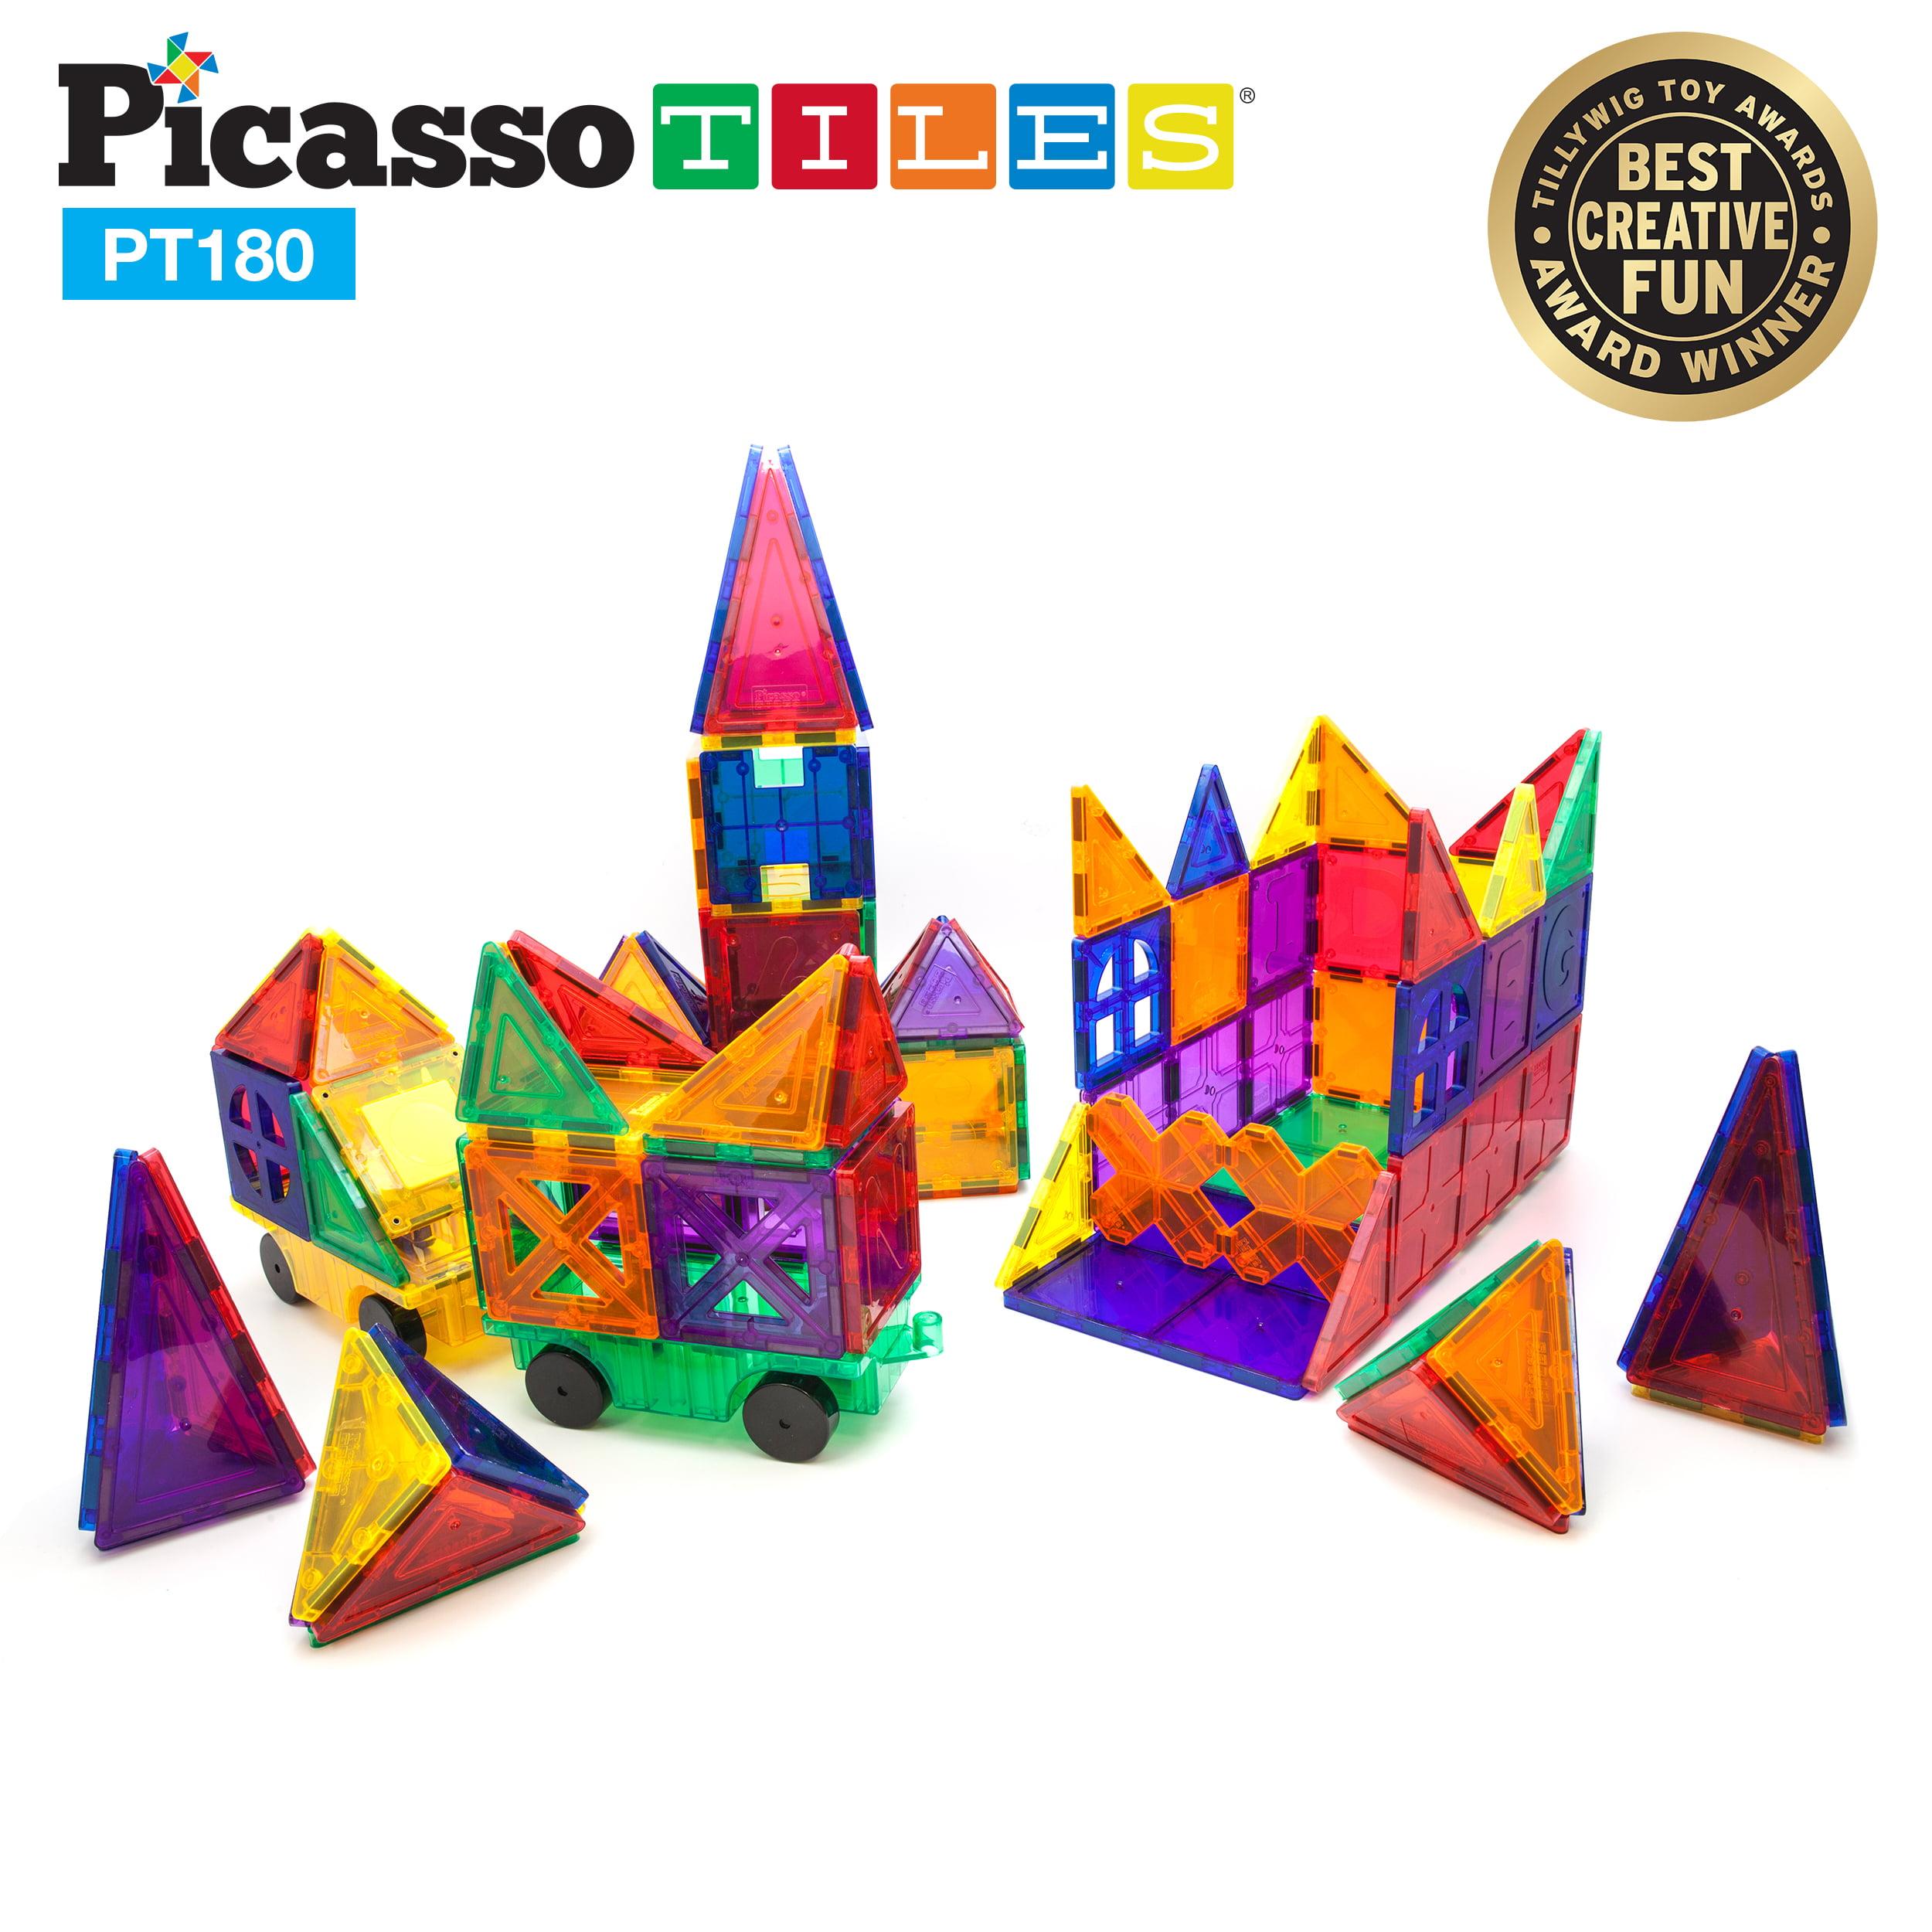 PicassoTiles 180 Piece Set 3D Color Magnetic Building Block Toy Deluxe Construction Kit by PicassoTiles